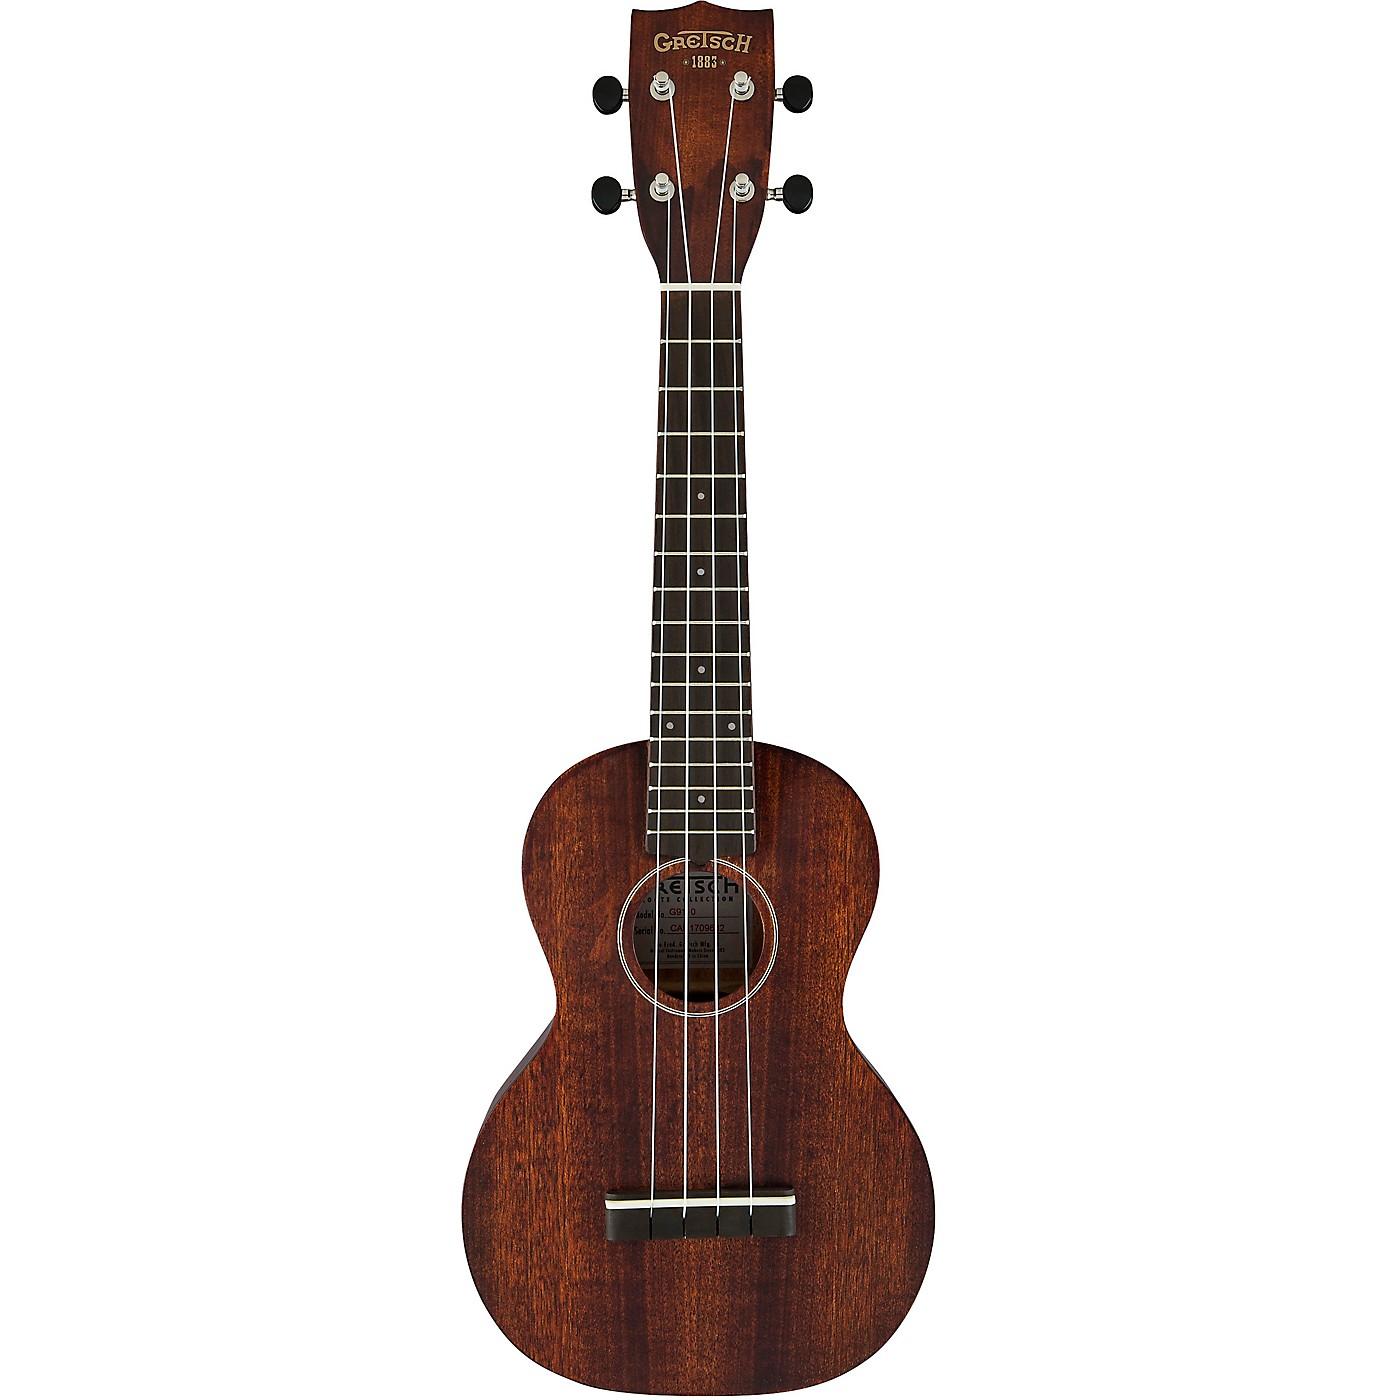 Gretsch Guitars G9110 Concert Standard Ukulele thumbnail